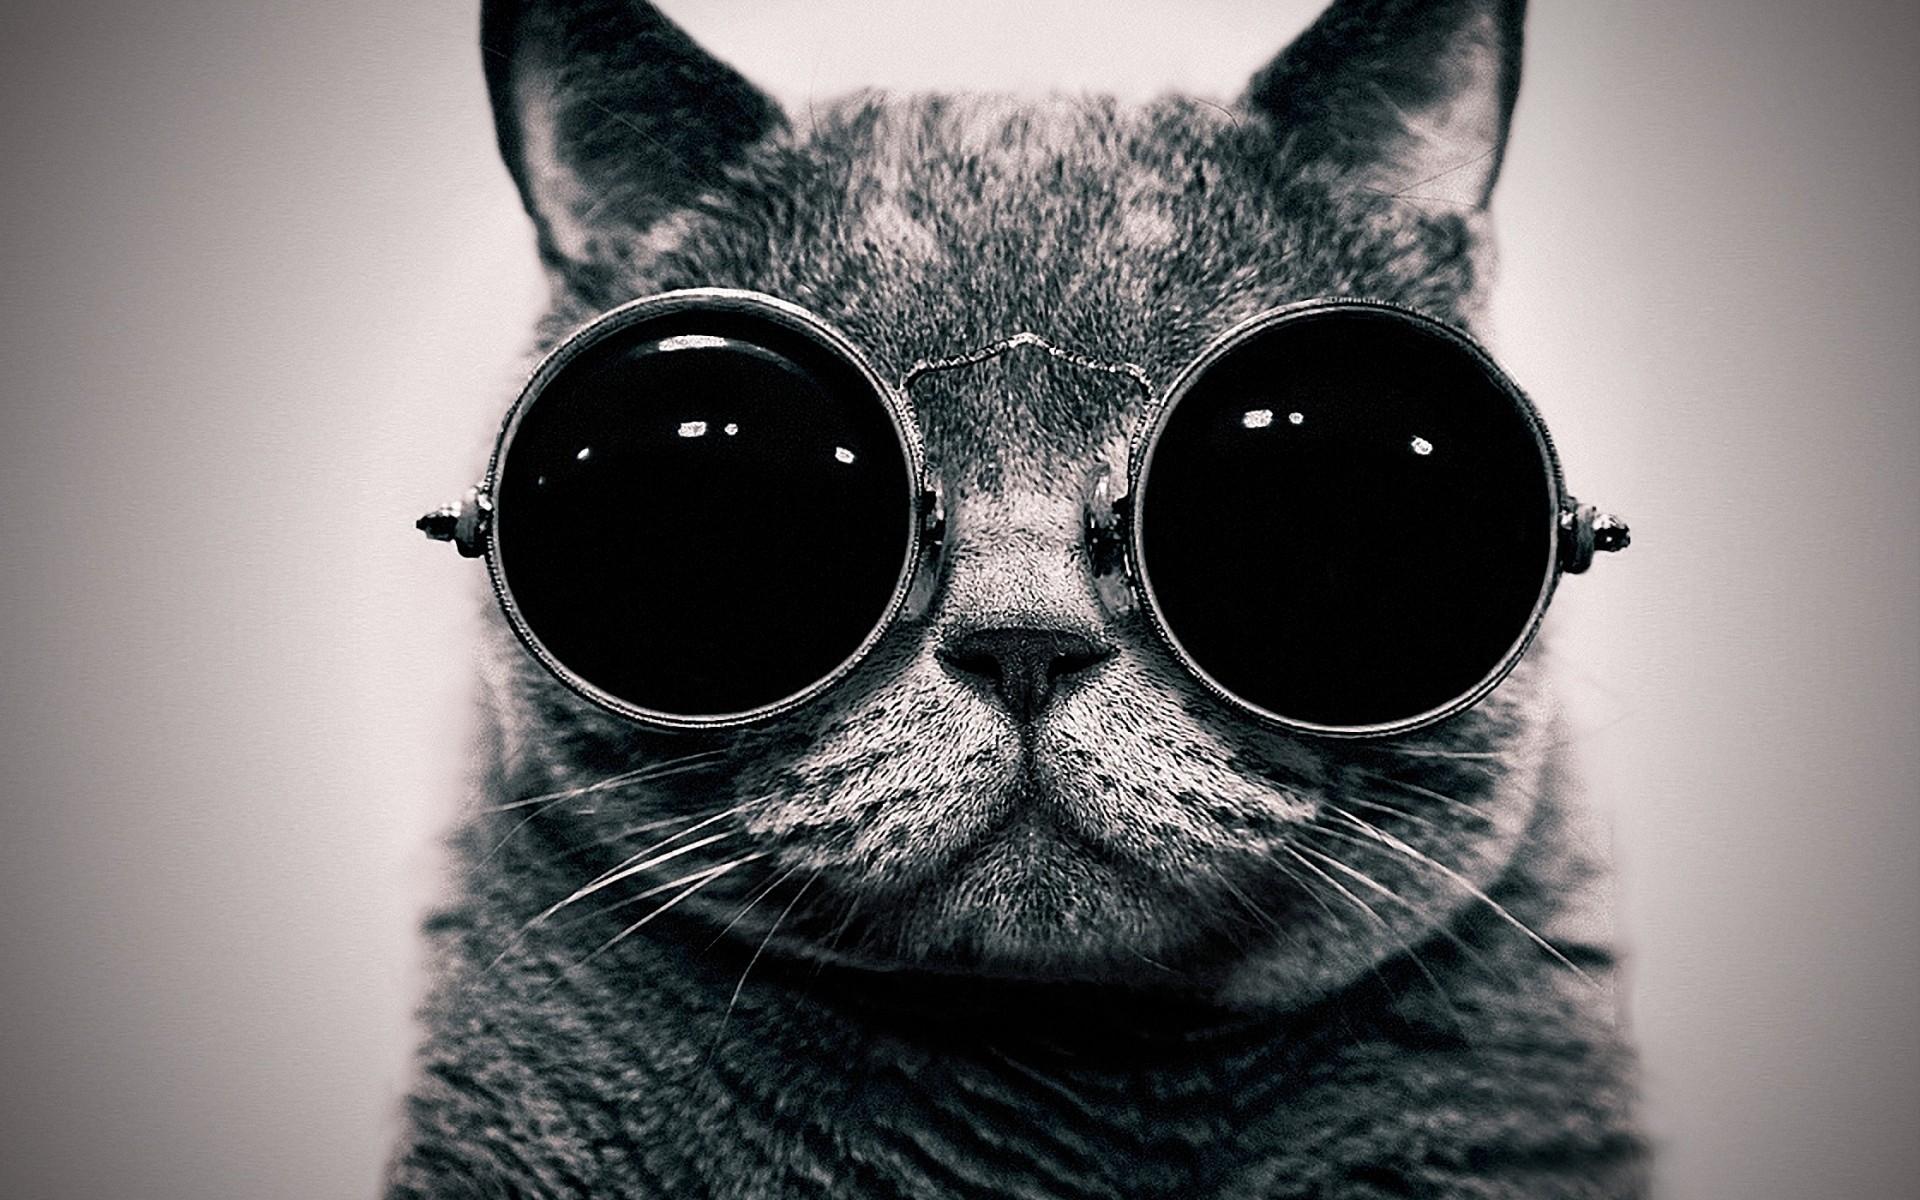 Cats animals glasses sunglasses hippie schrodingers cat monochrome 1920x1200